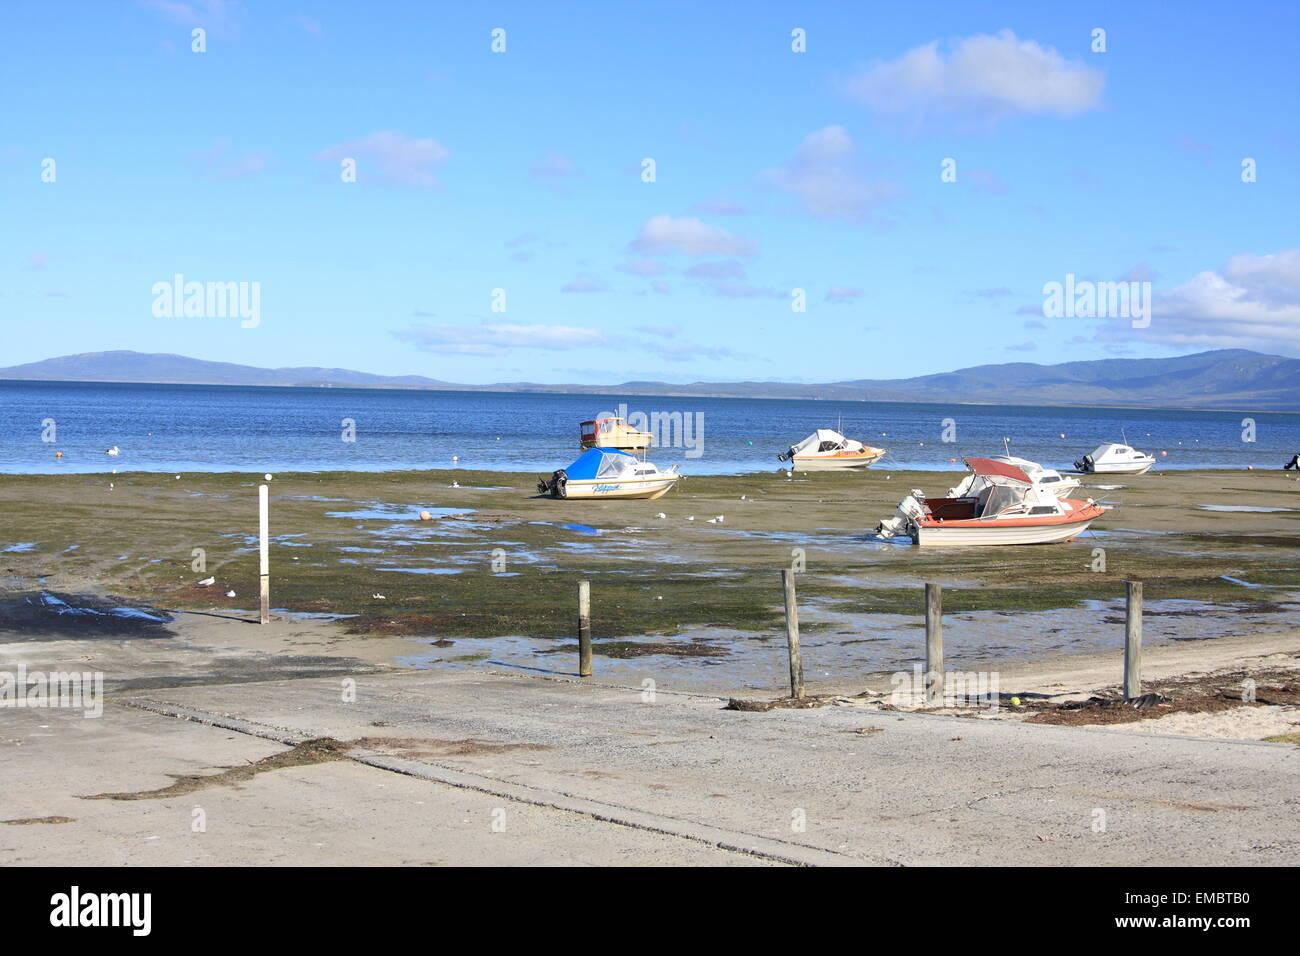 Boote bei Ebbe South Gippsland Victoria Australia Stockbild